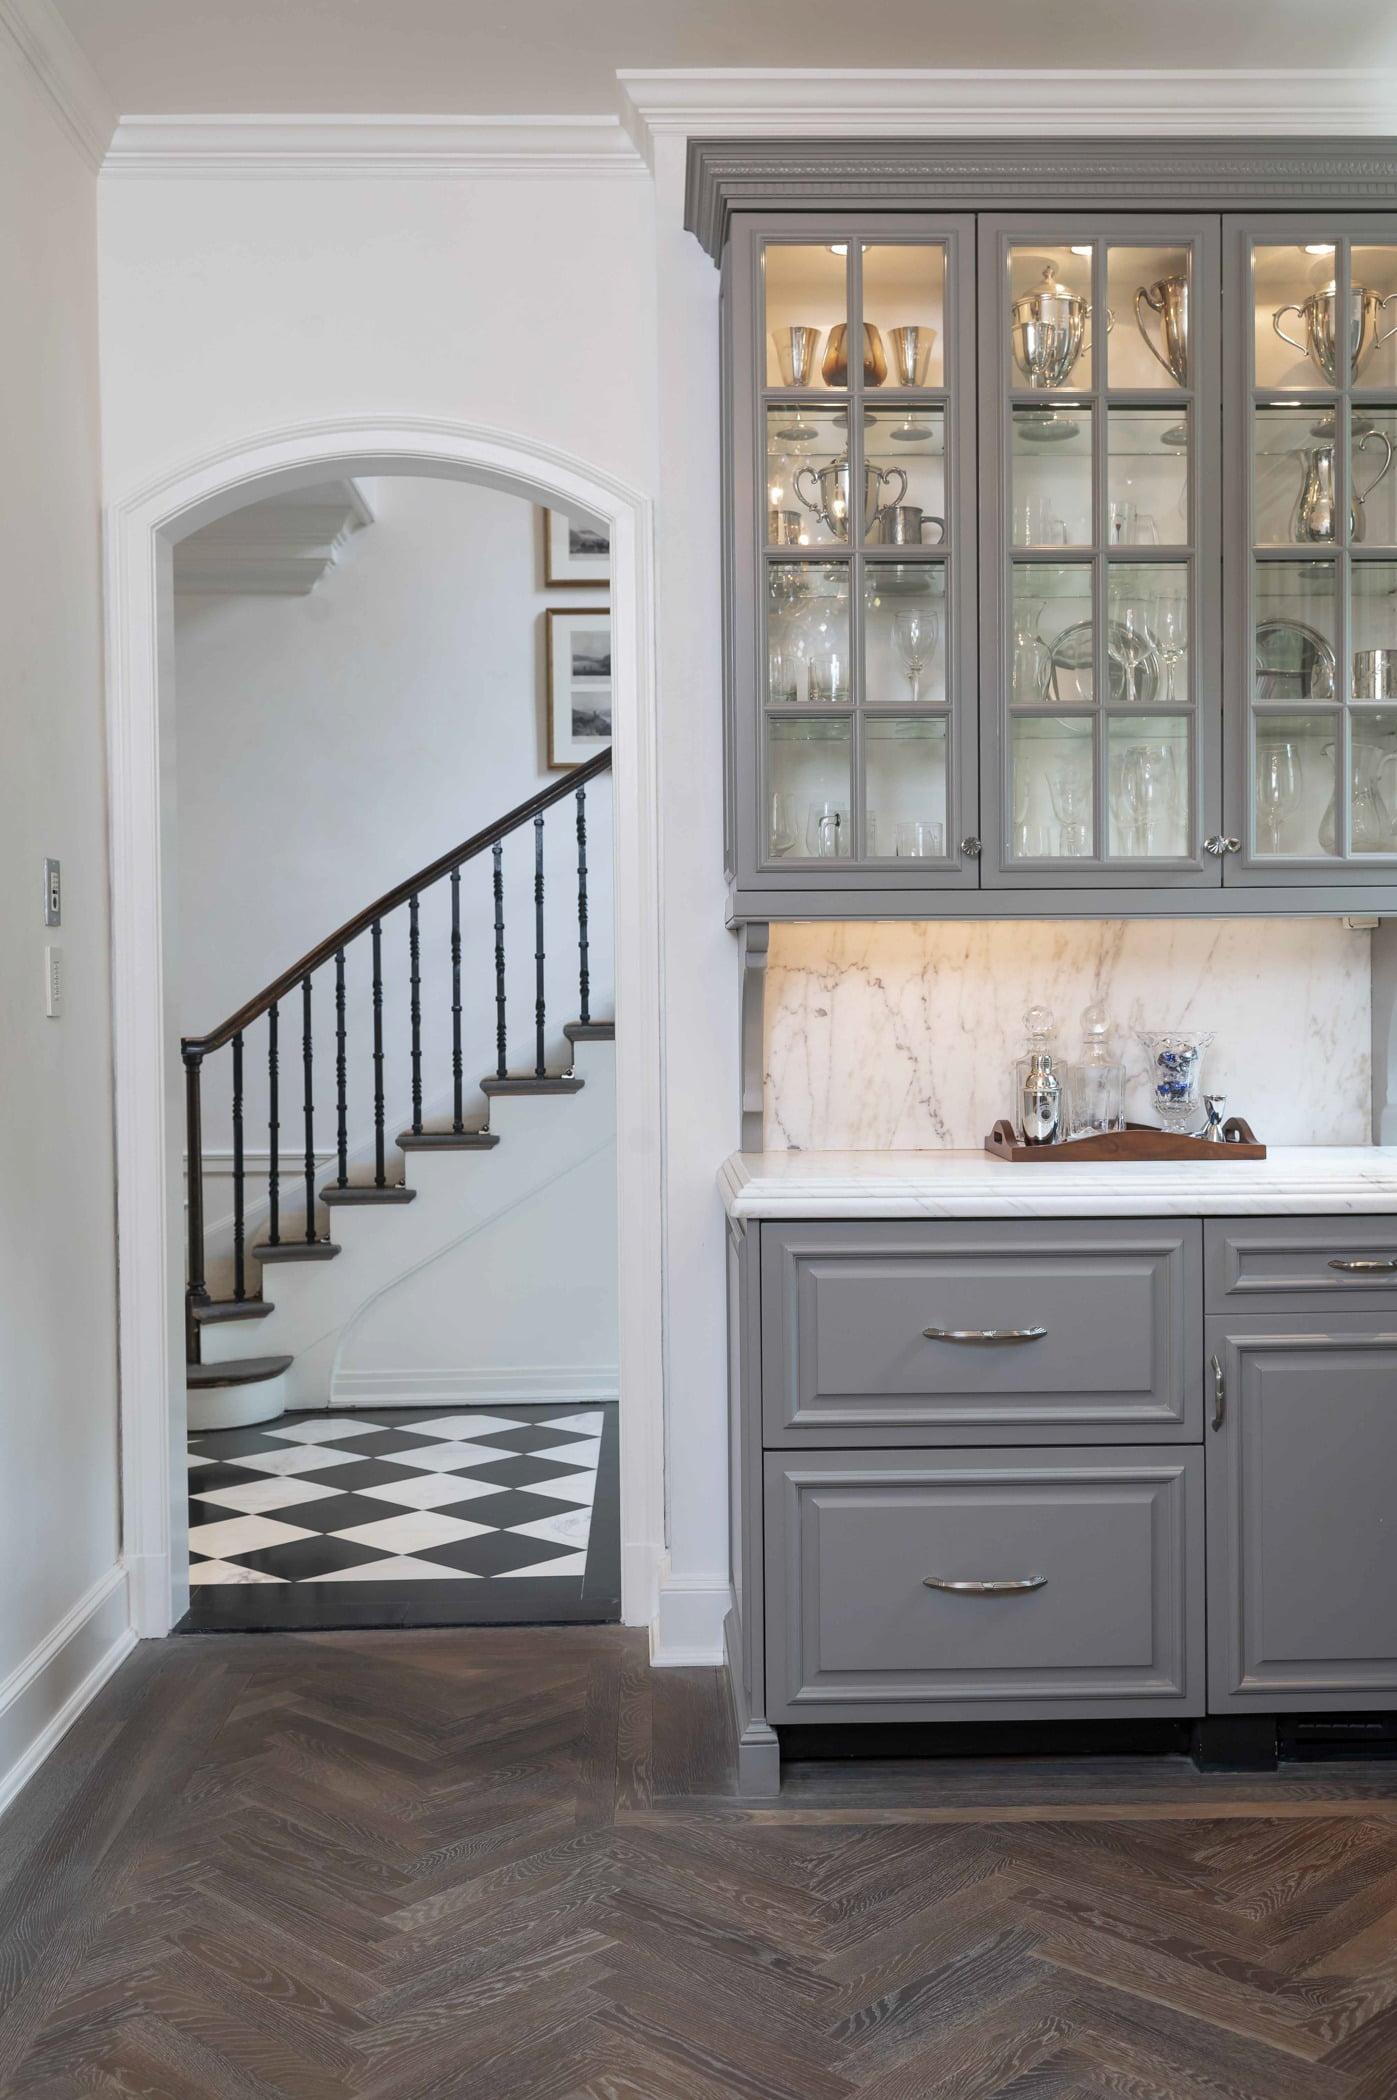 Traditional kitchen area with custom light grey cabinetry, marble countertops, and dark chevron hardwood flooring (Doorway view)